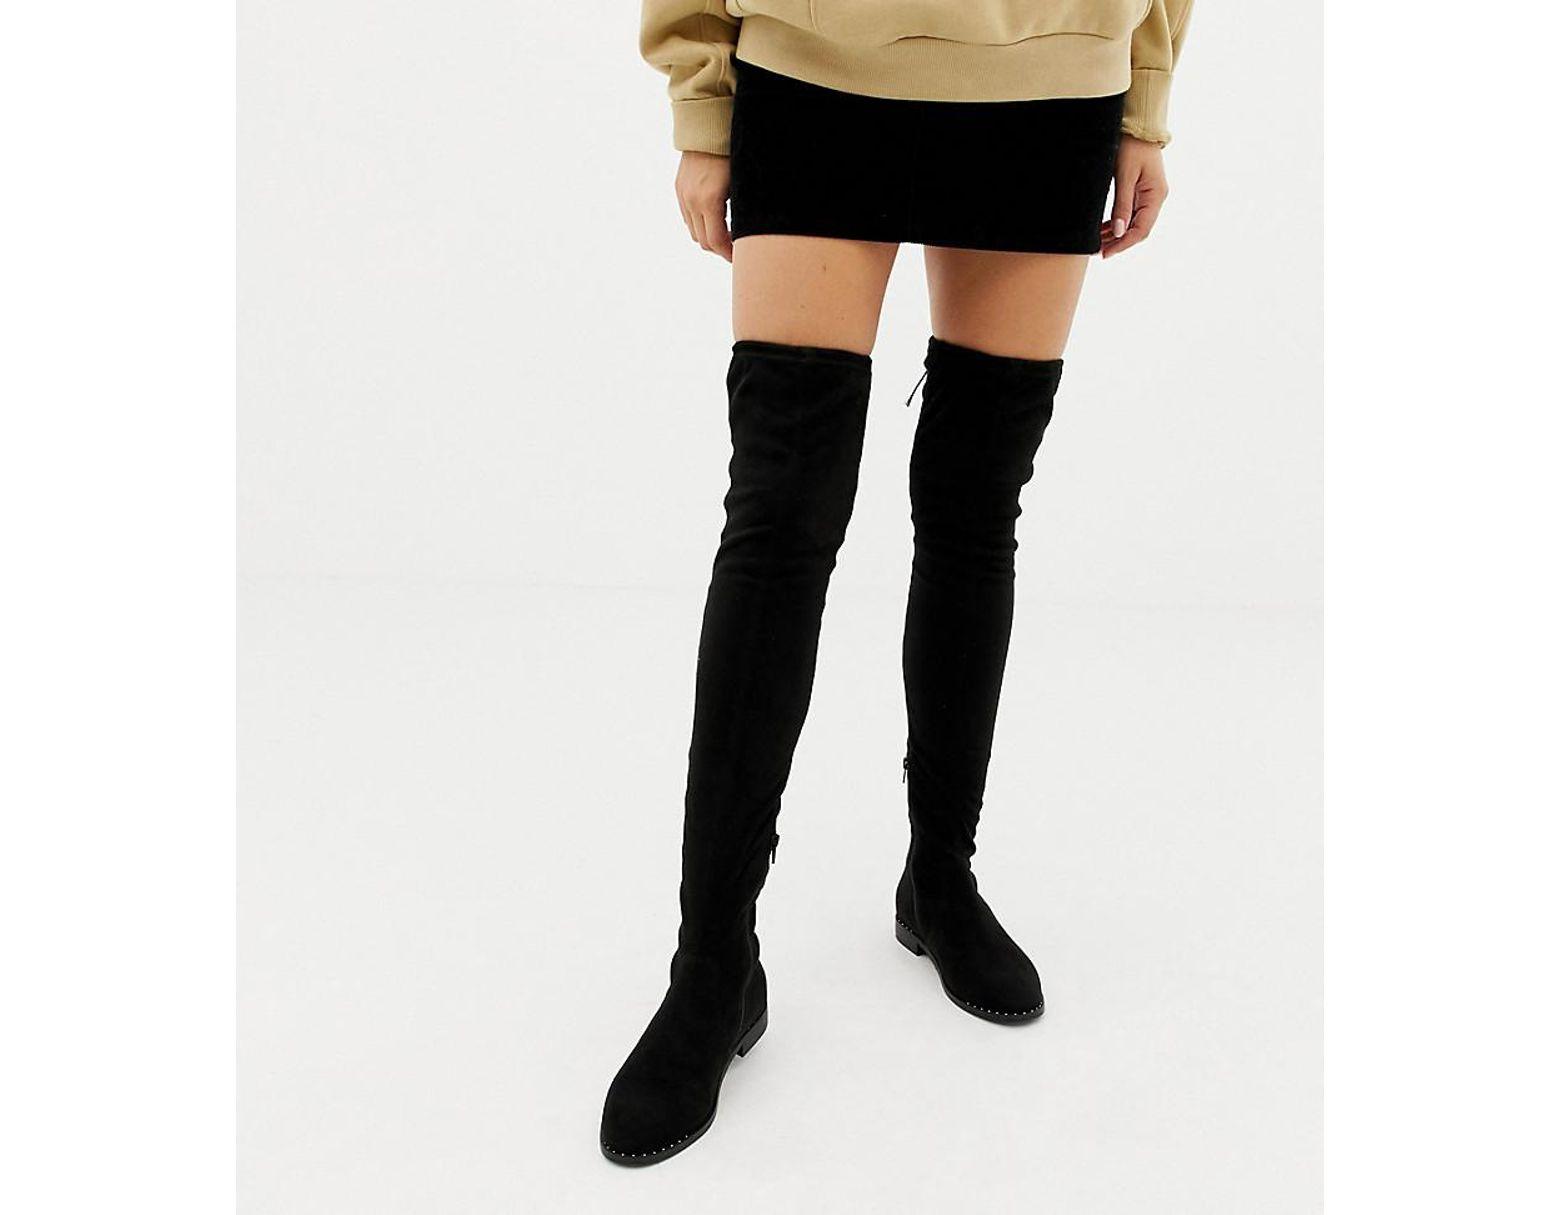 49dc8f4276a Women's Black Wide Fit Extra Wide Leg Kaska Flat Studded Thigh High Boots